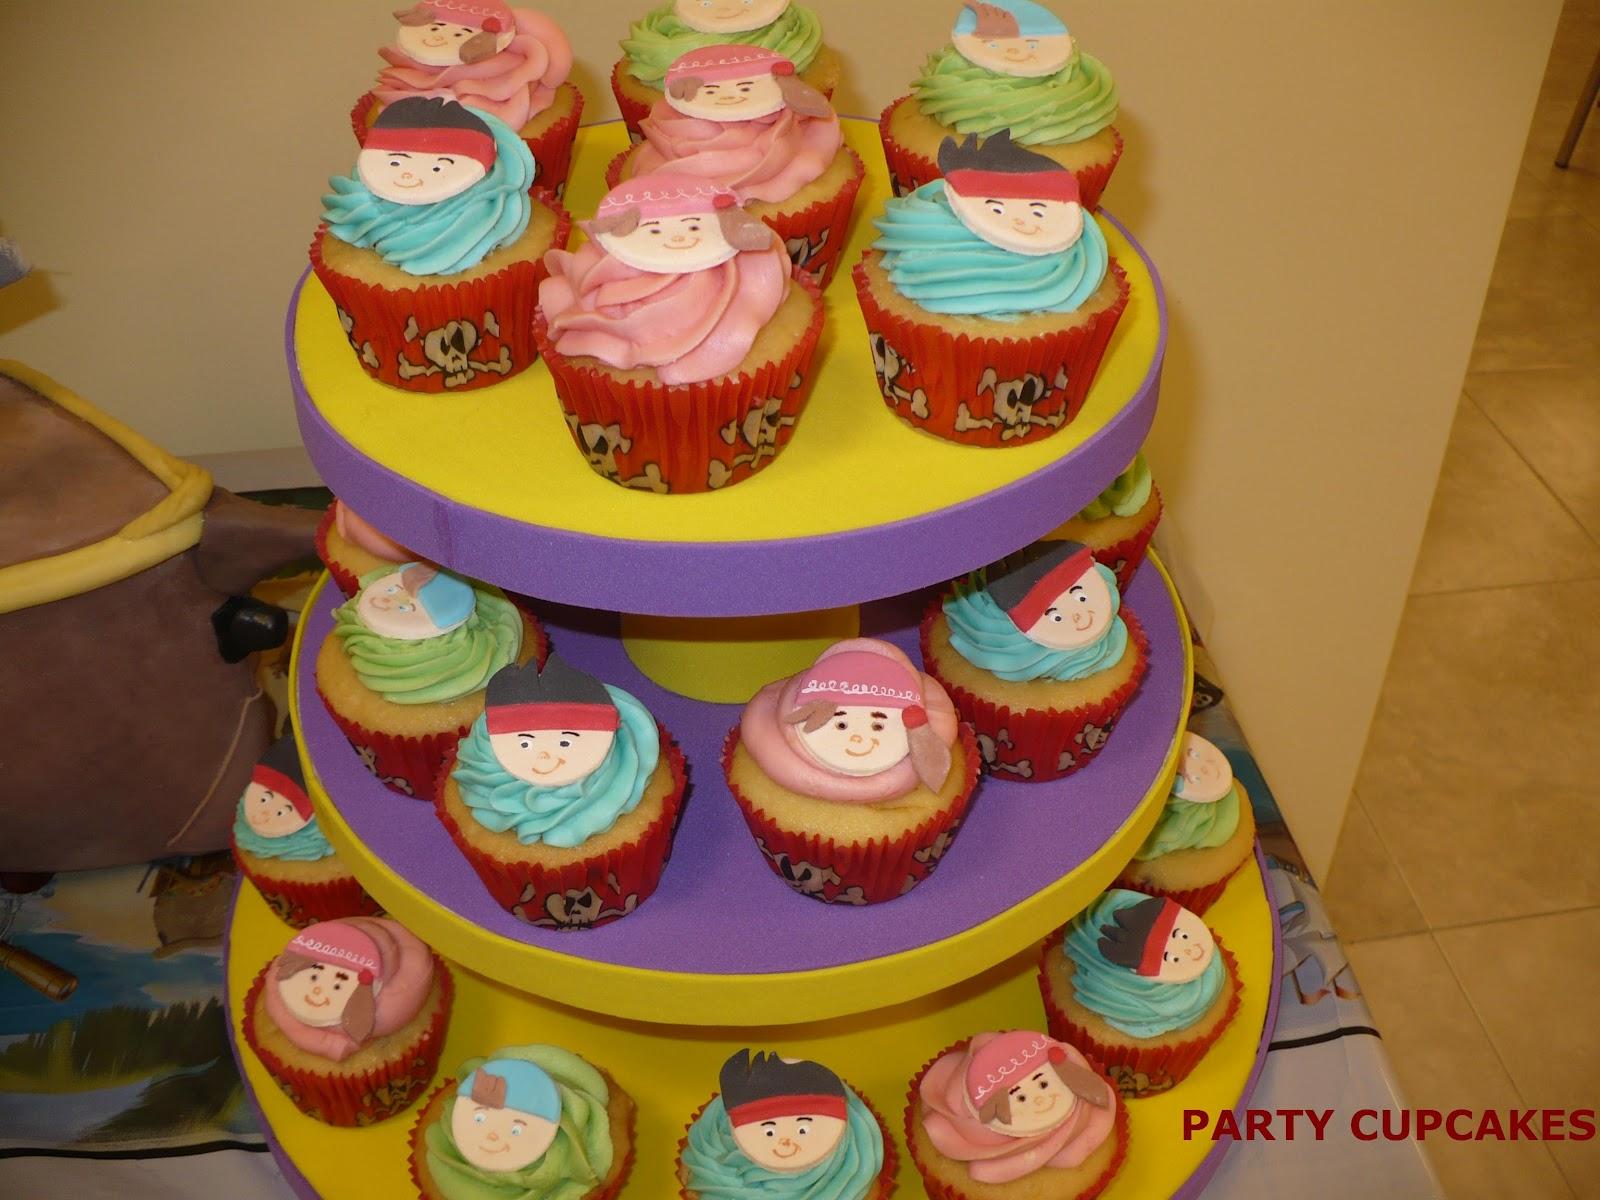 Cupcakes Con La Tem  Tica De Piratas De Nunca Jam  S De Disney